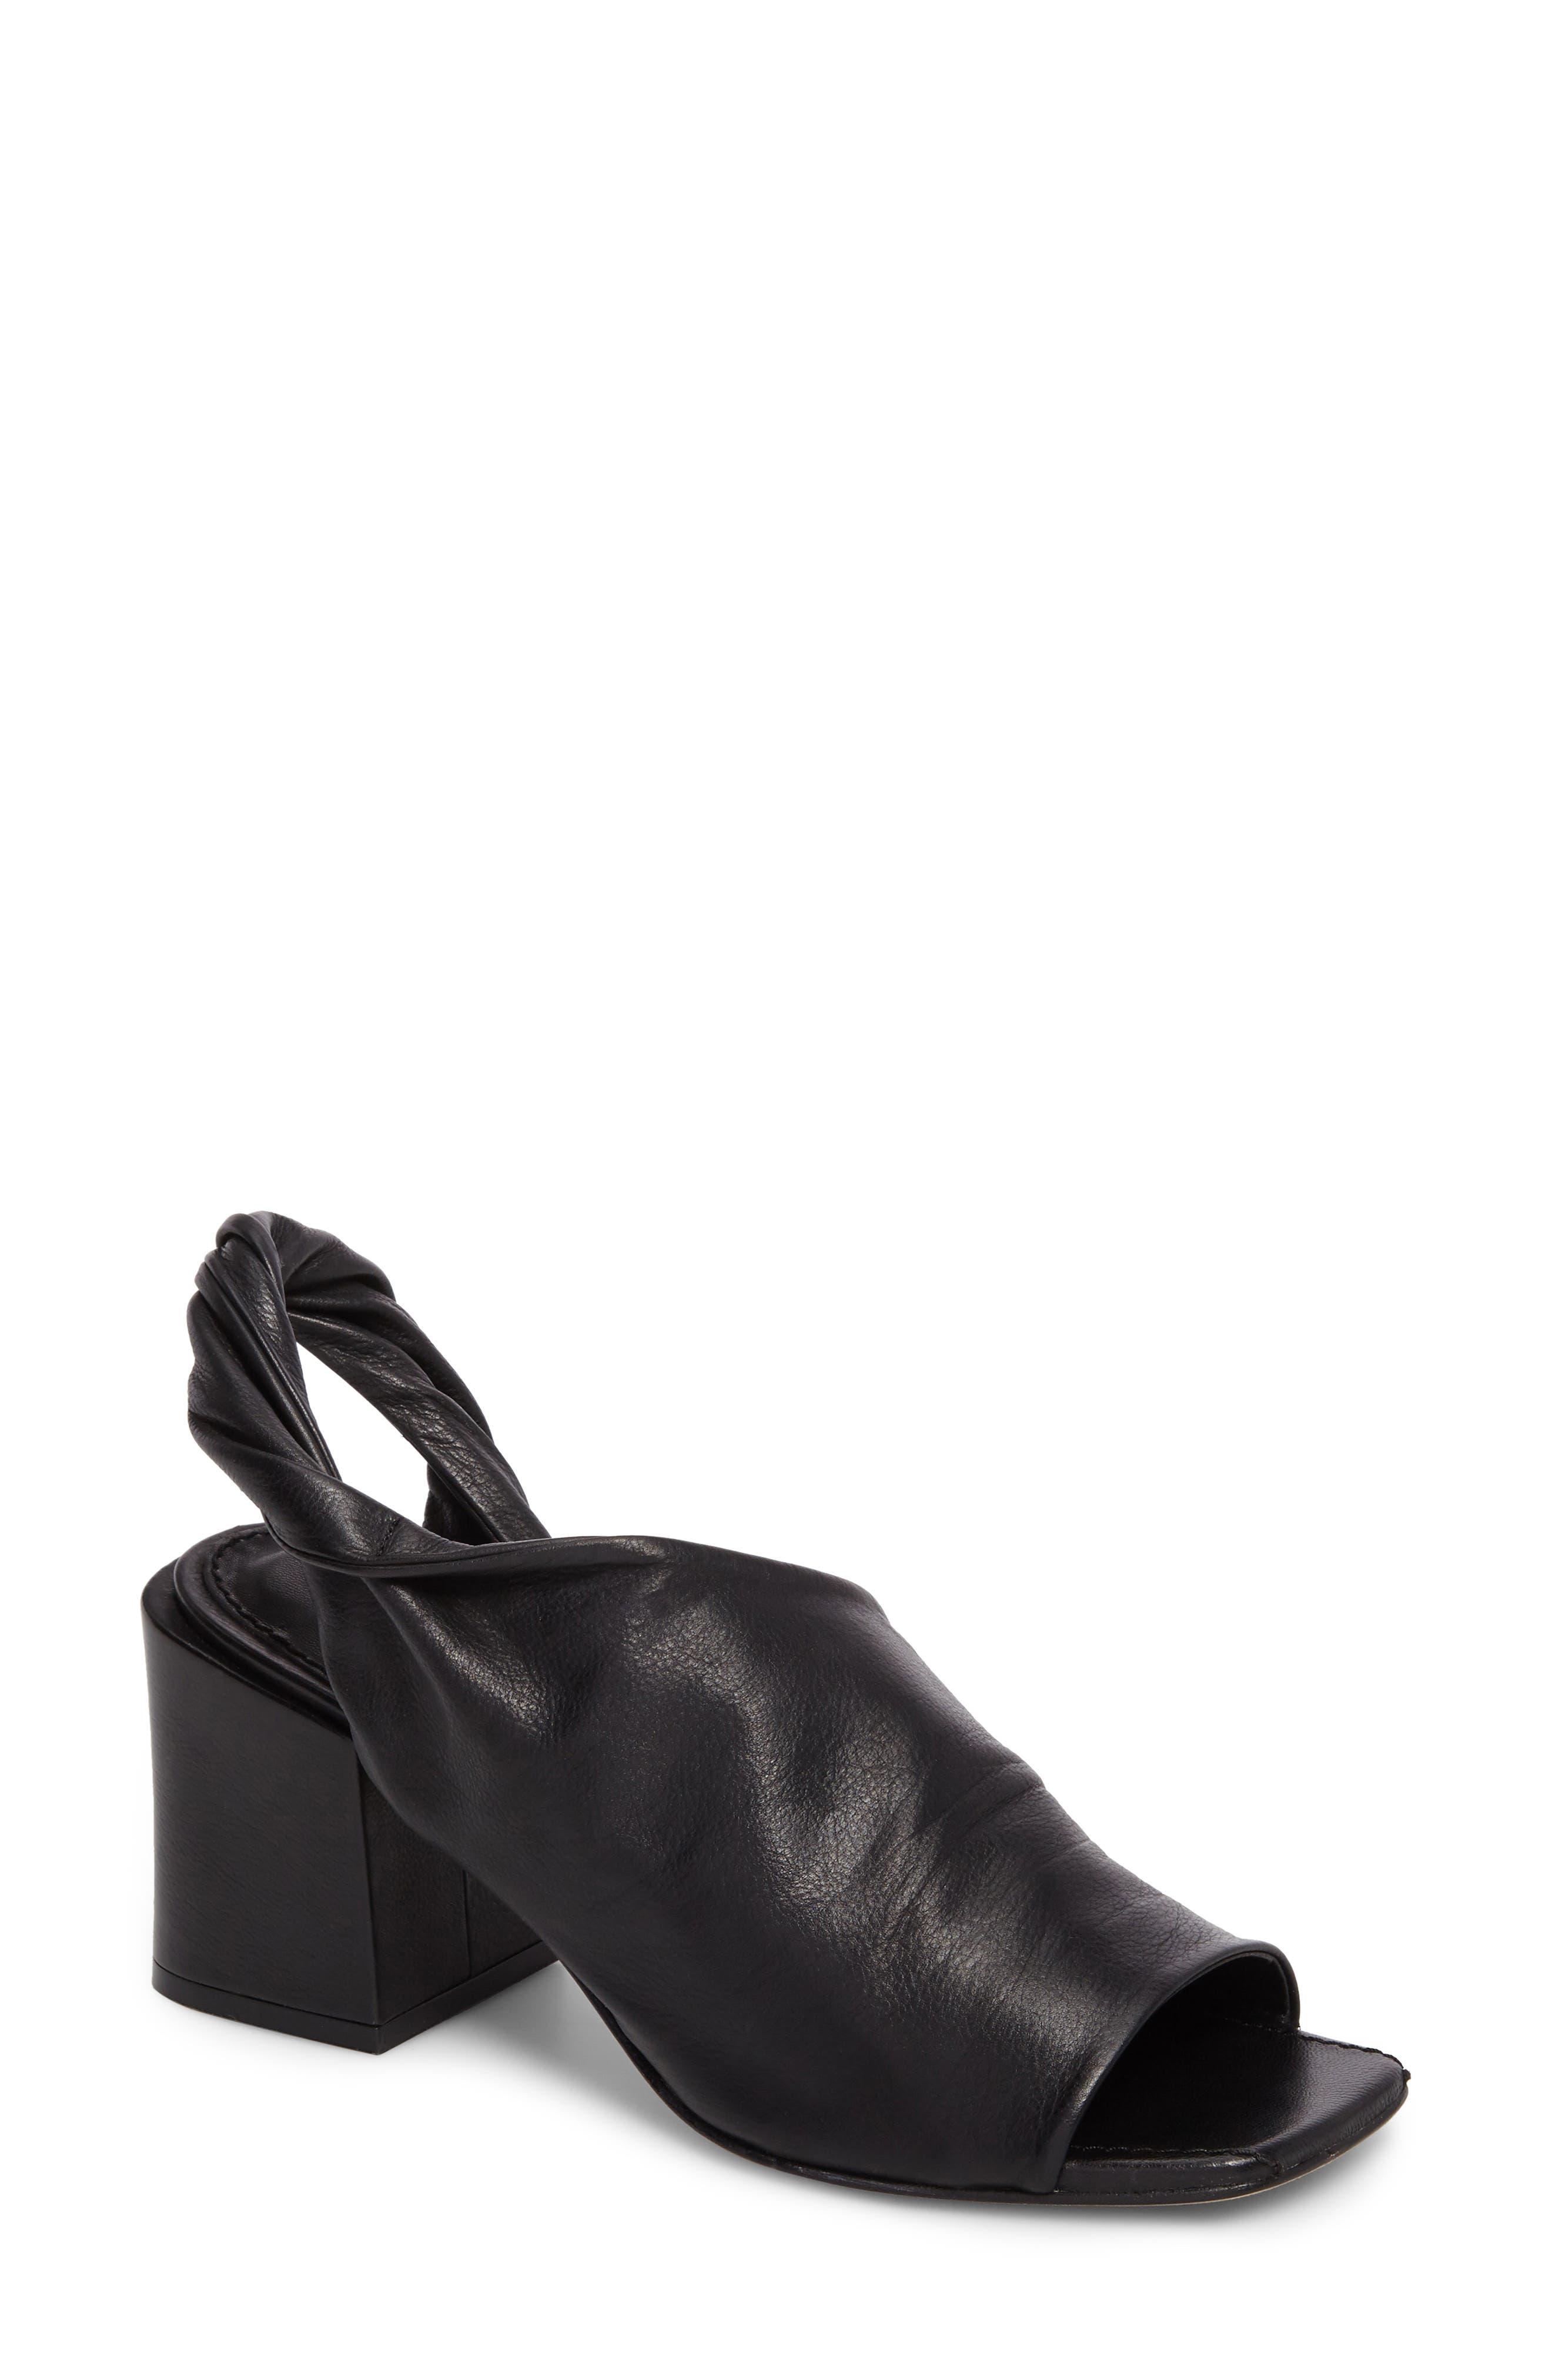 Lenny Block Heel Sandal,                         Main,                         color, Black